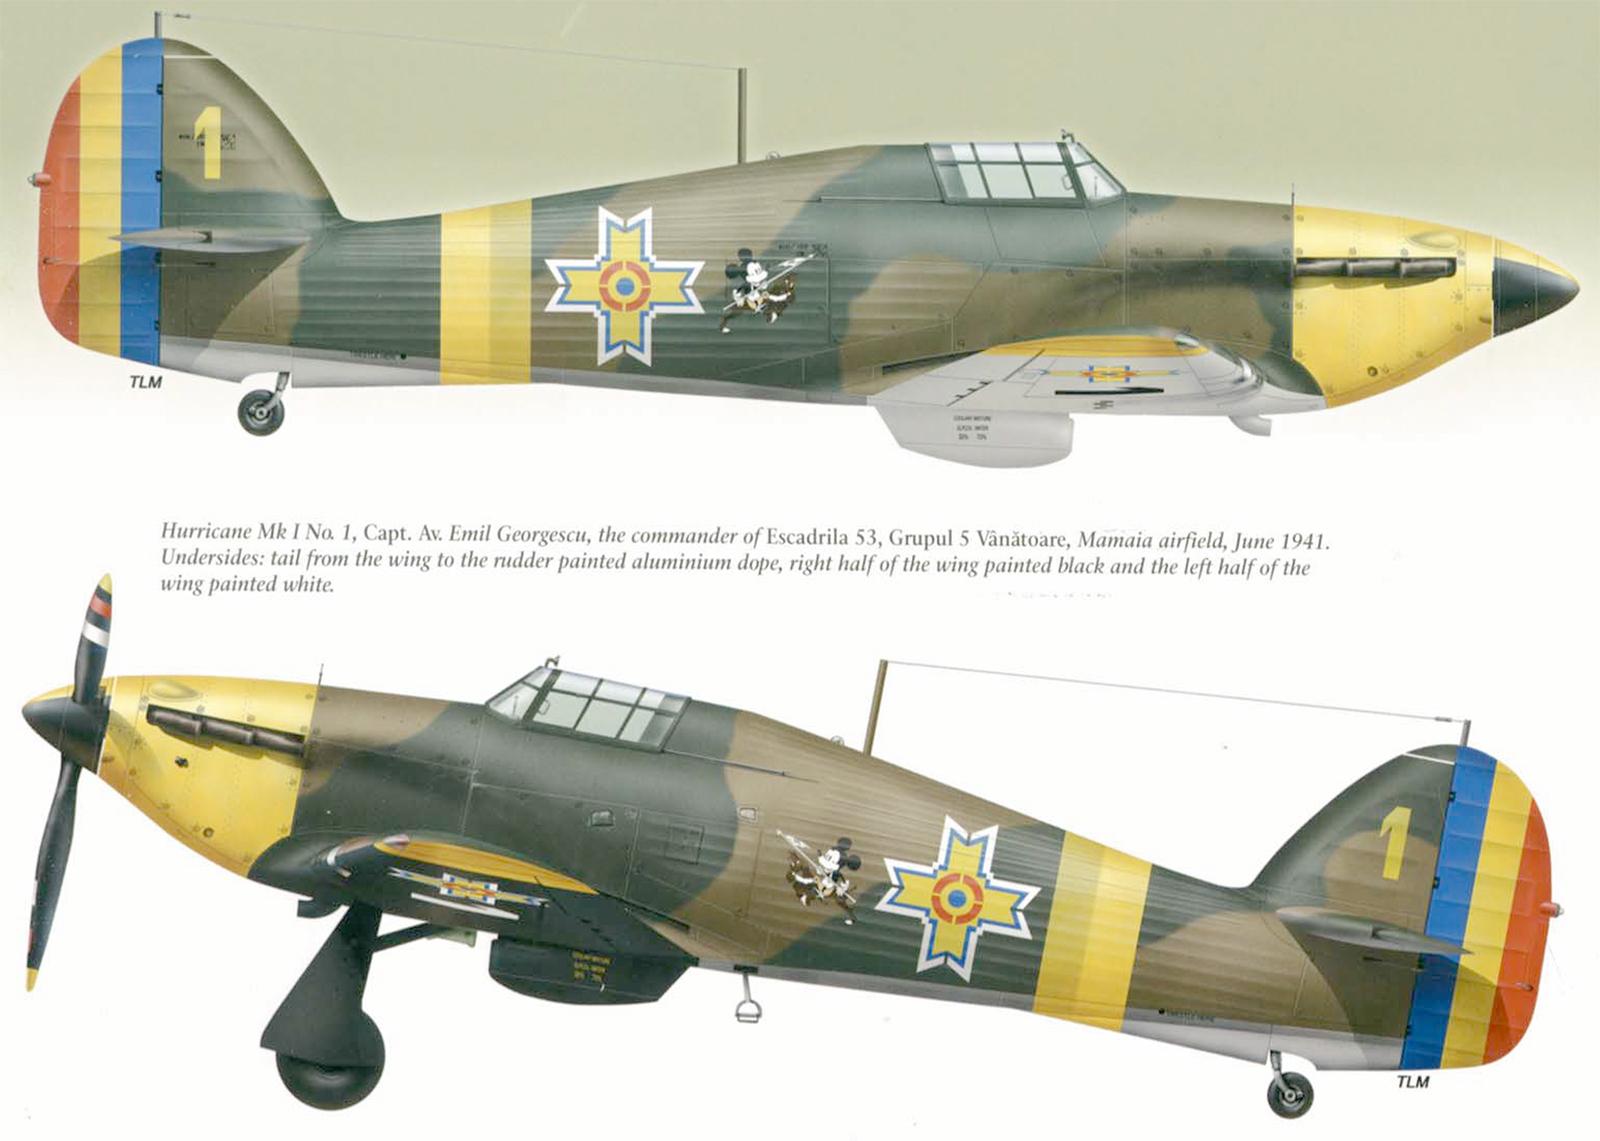 Hawker Hurricane Rumanian AF Esc 53 Yellow 1 Horia Agarici Rumania 1941 Mushroom 9111 0A